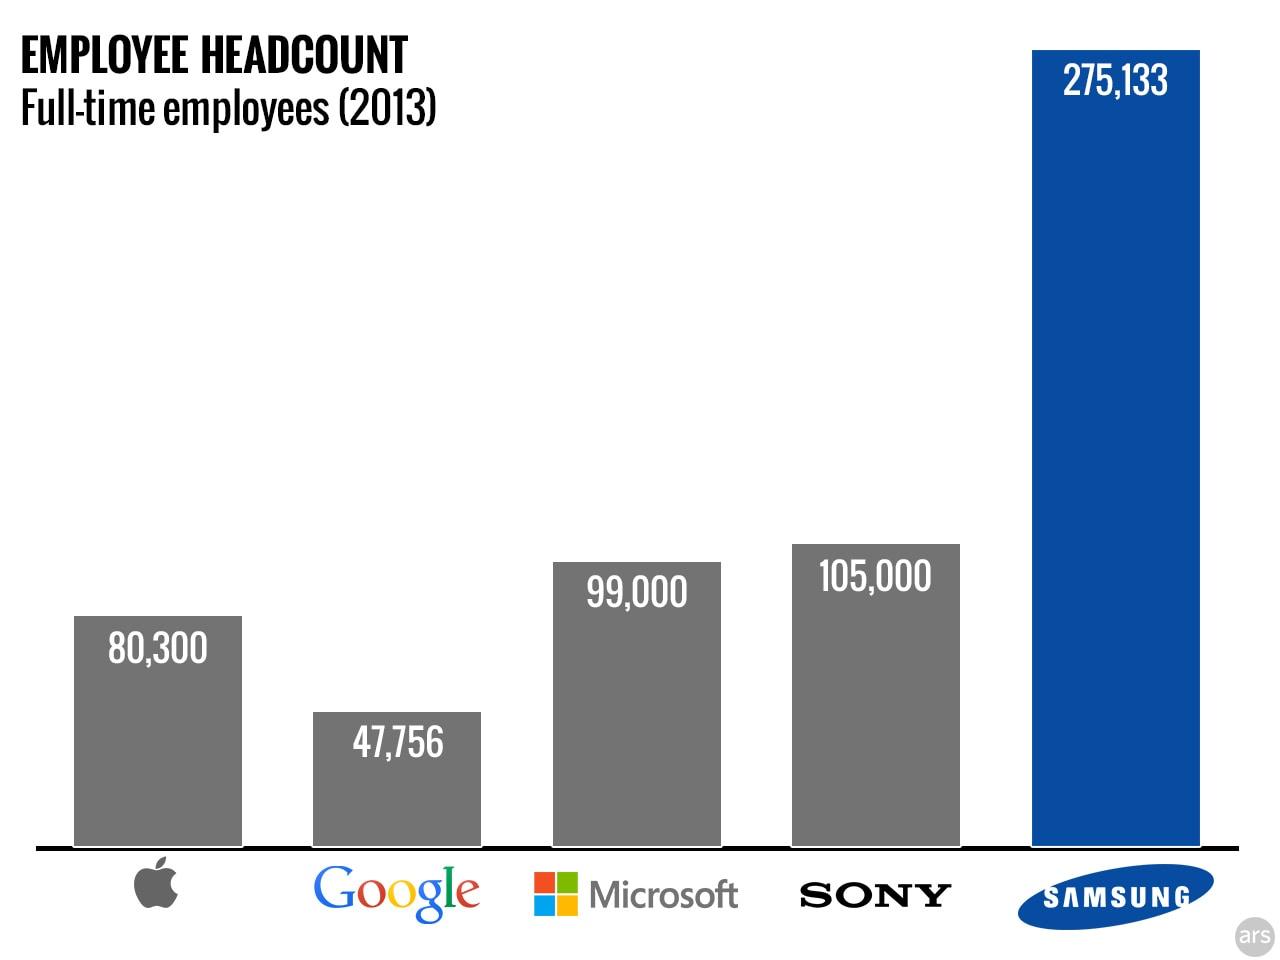 Quanti impiegati ha Samsung? Più di Microsoft, Apple e Google insieme